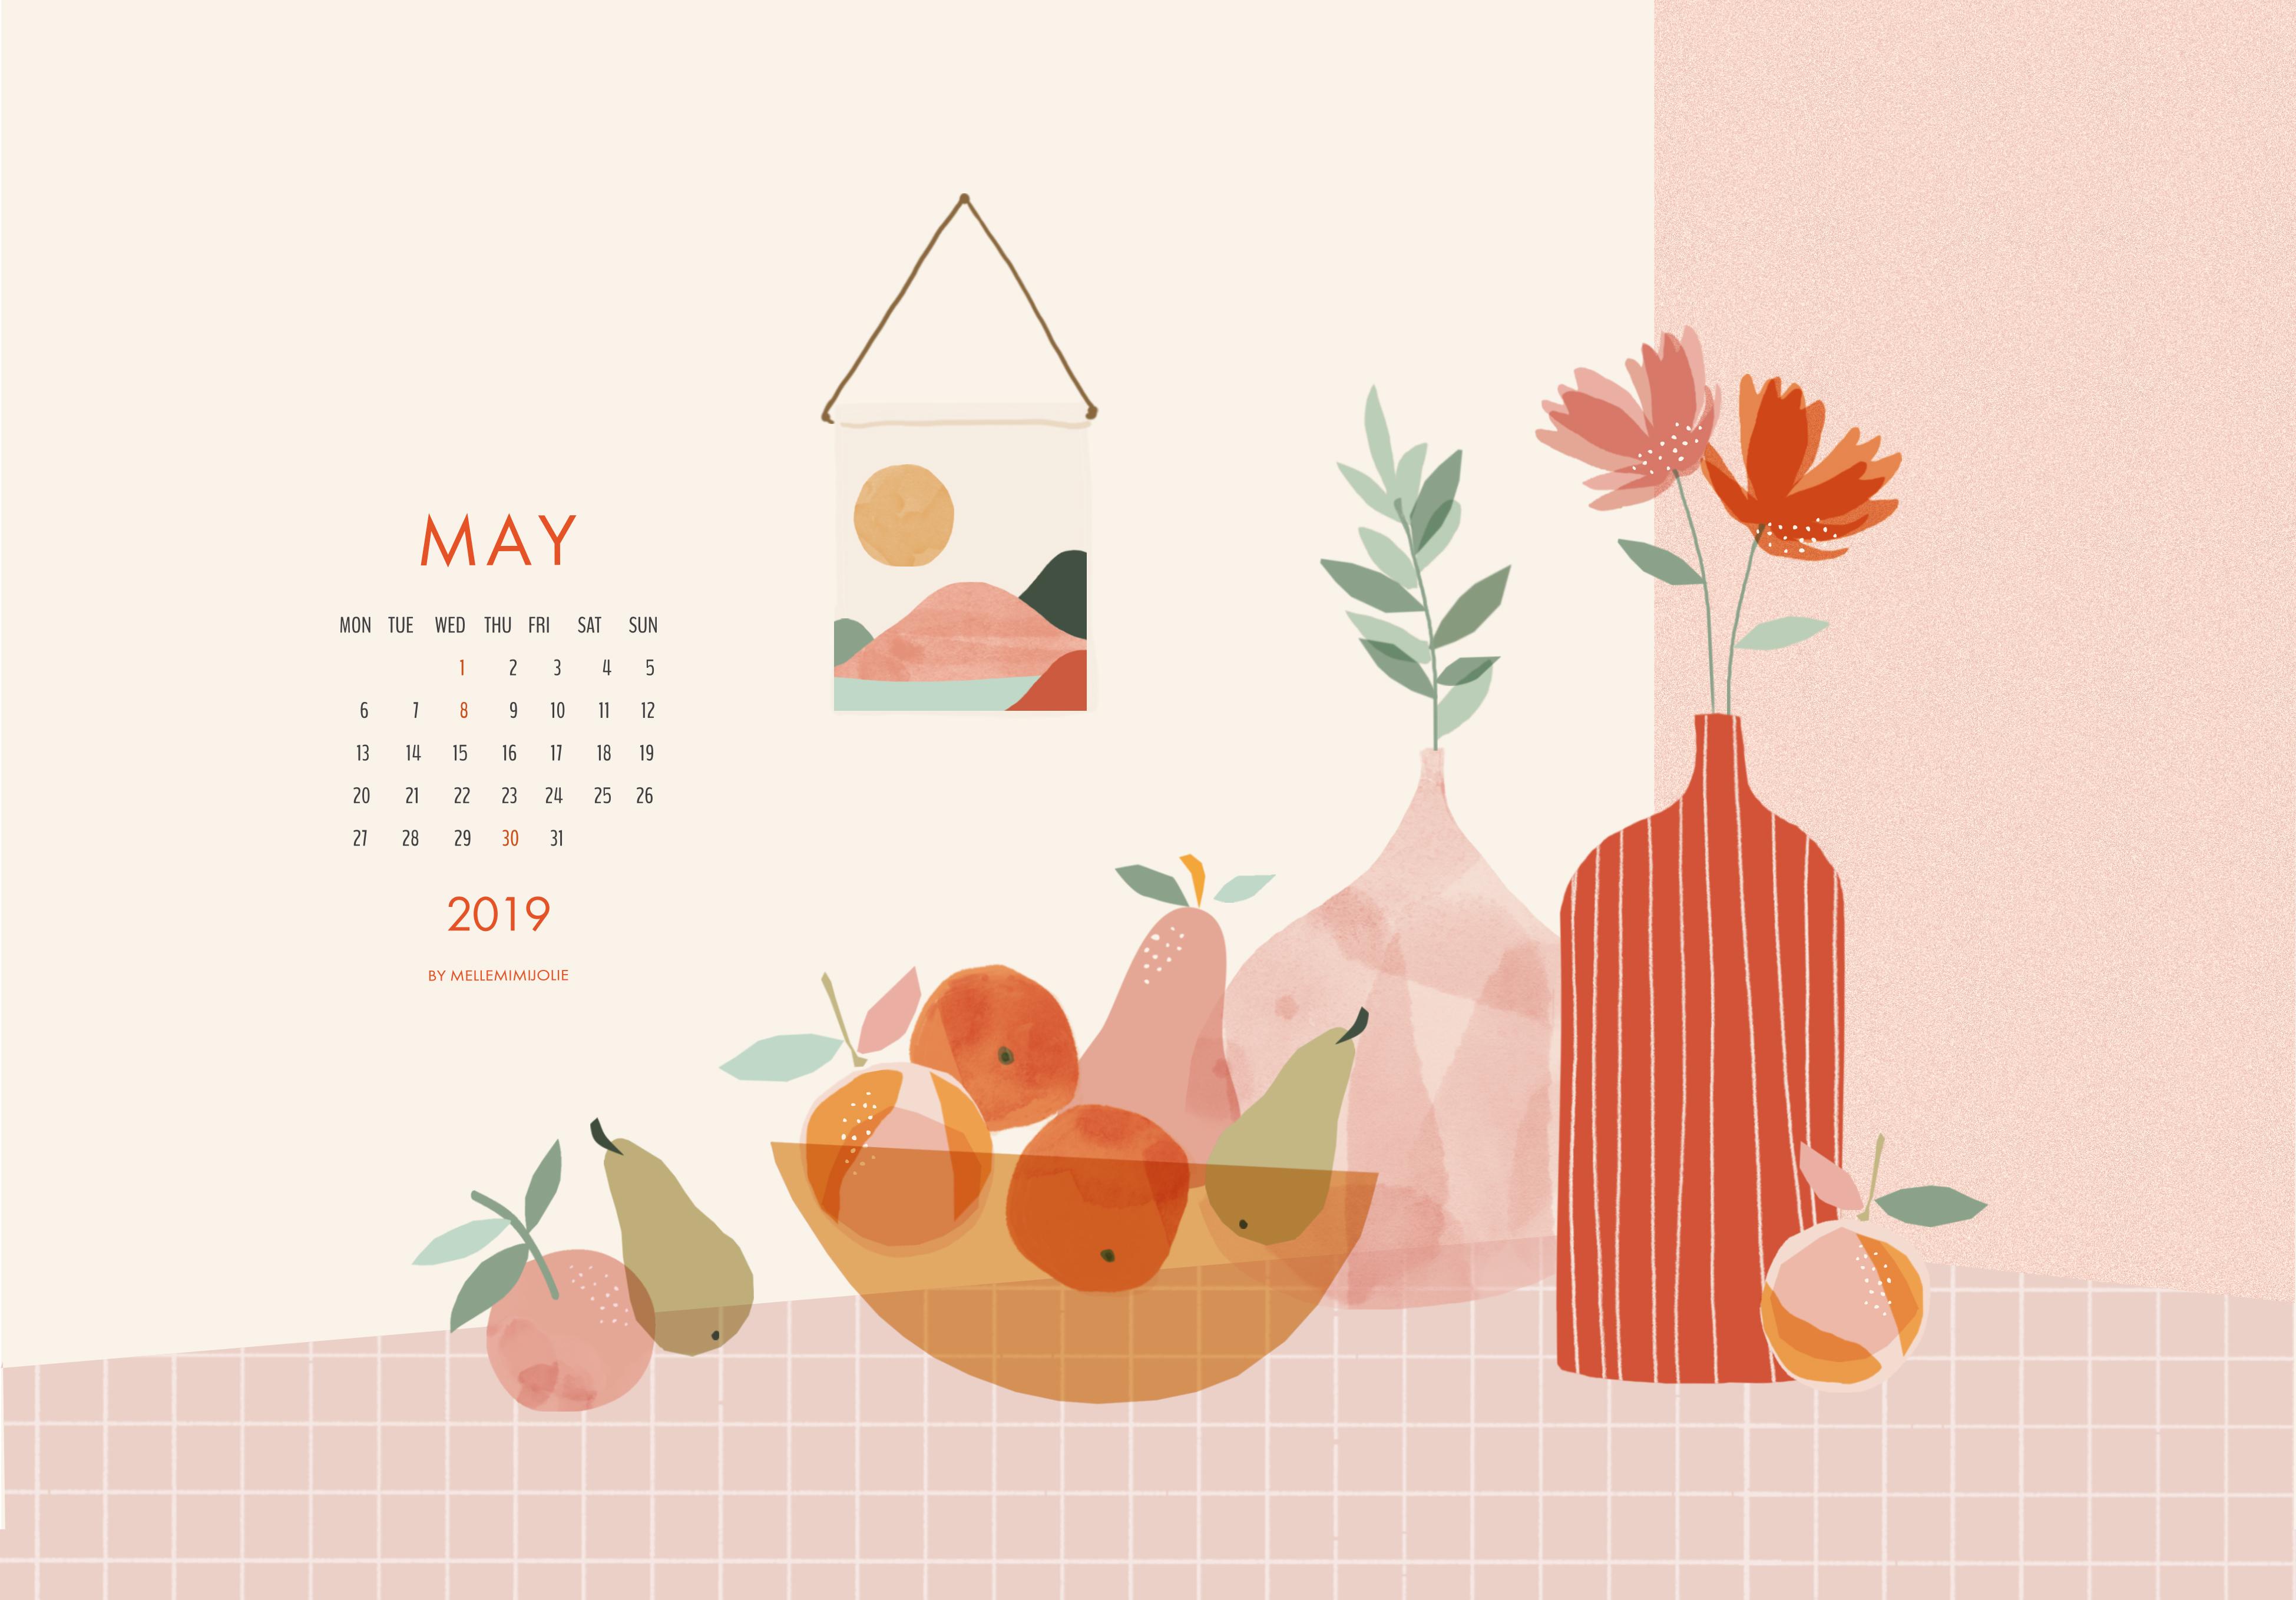 fruit-flower-may-mellemimijolie